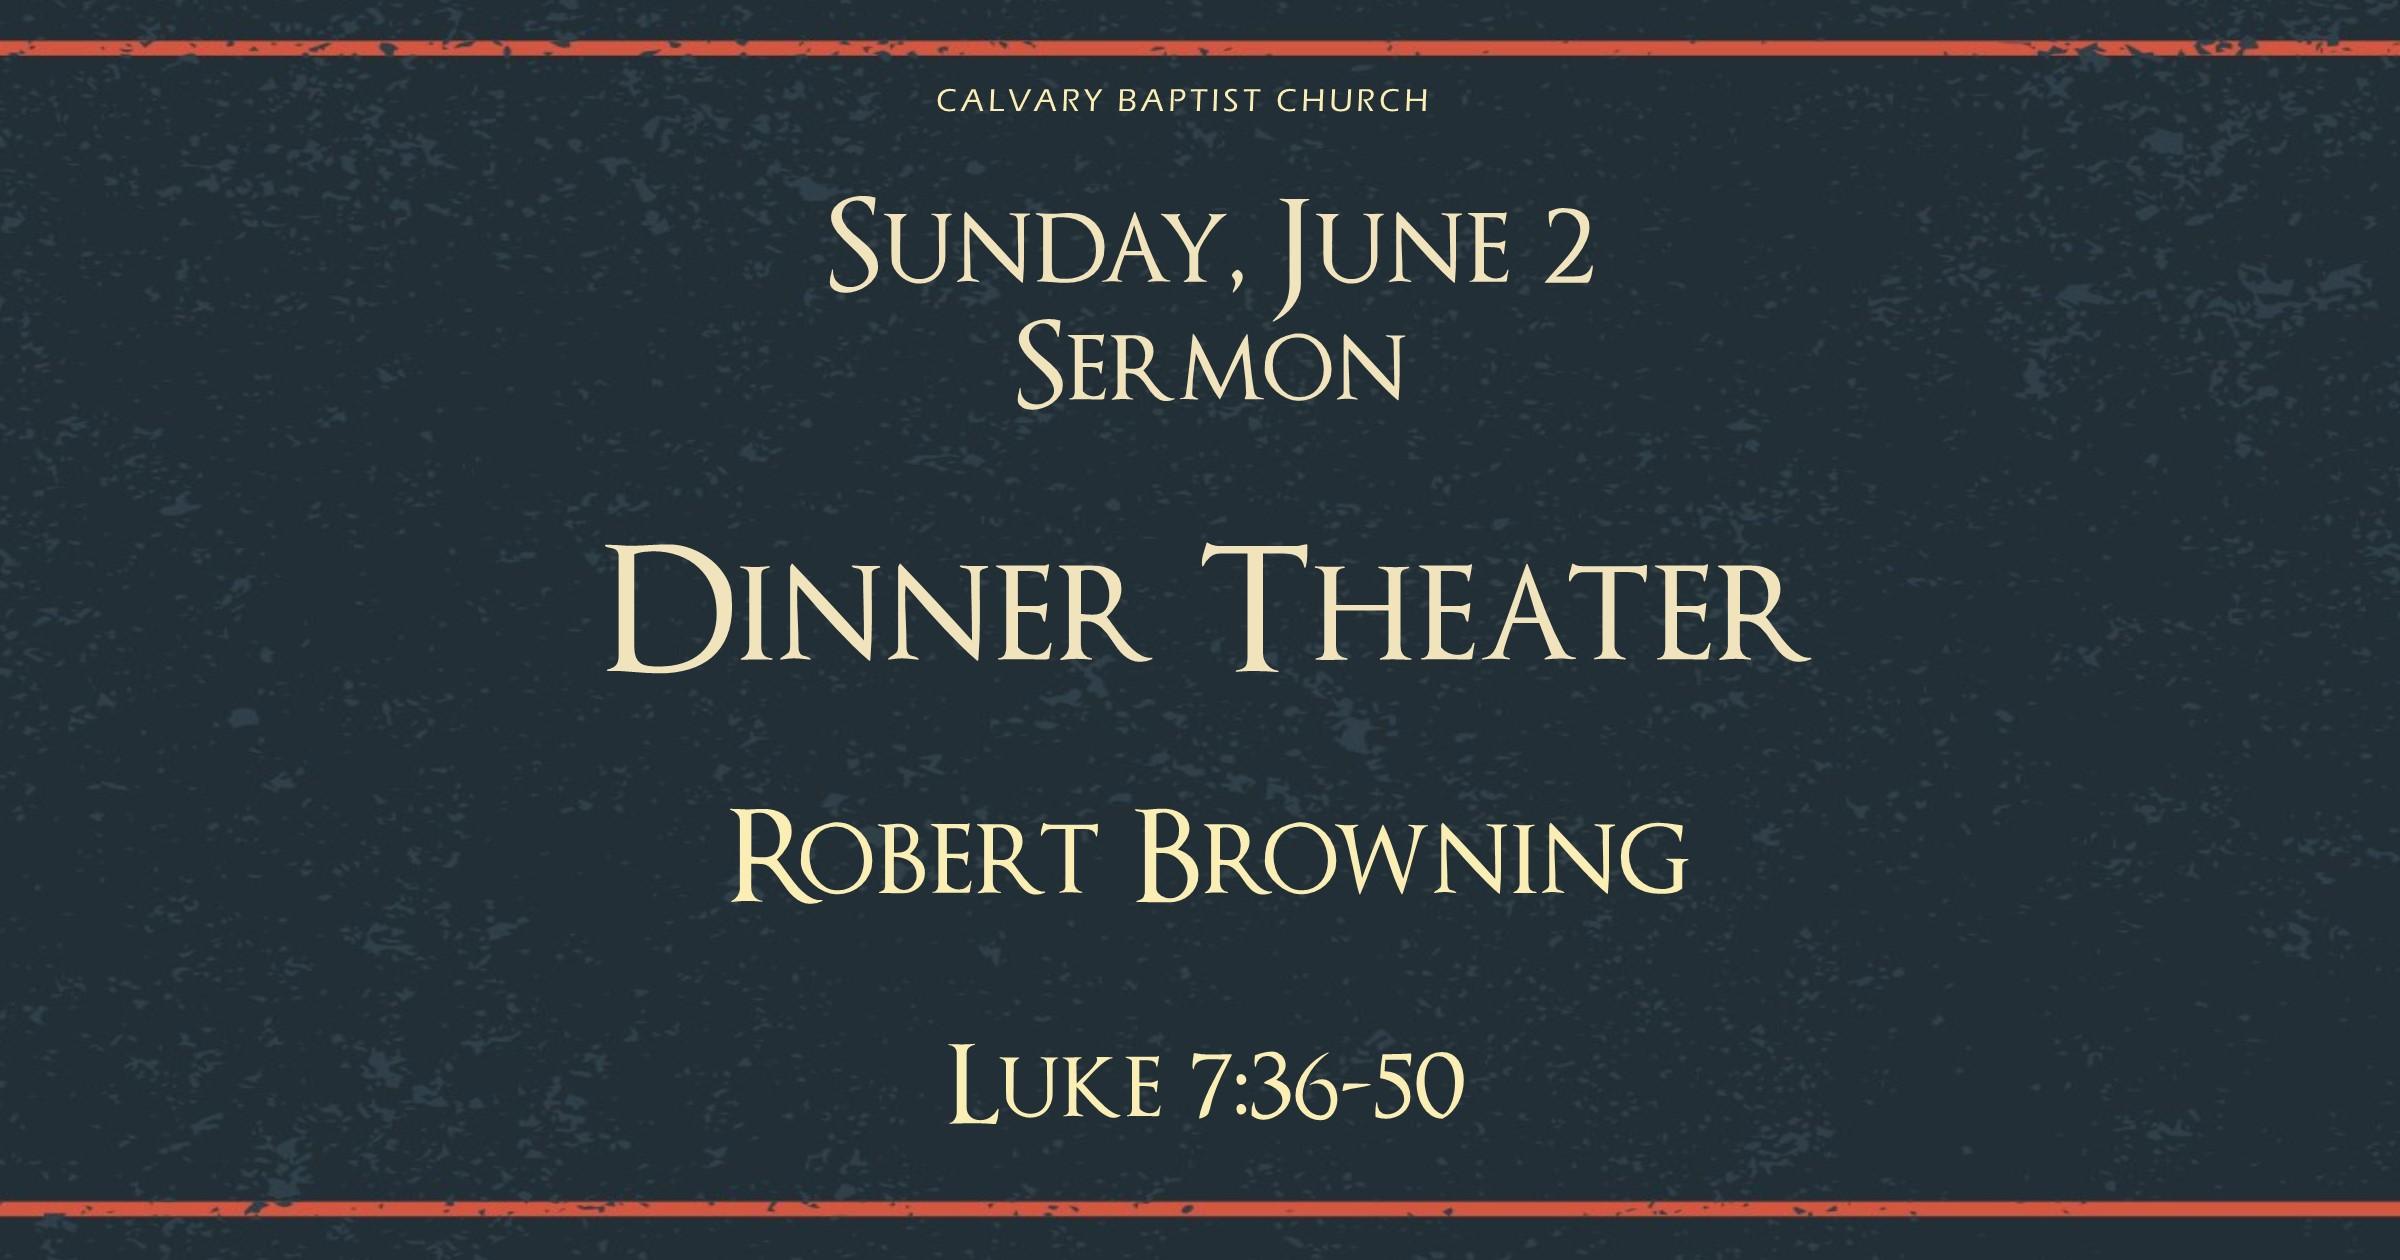 June 2 sermon fb image.jpg